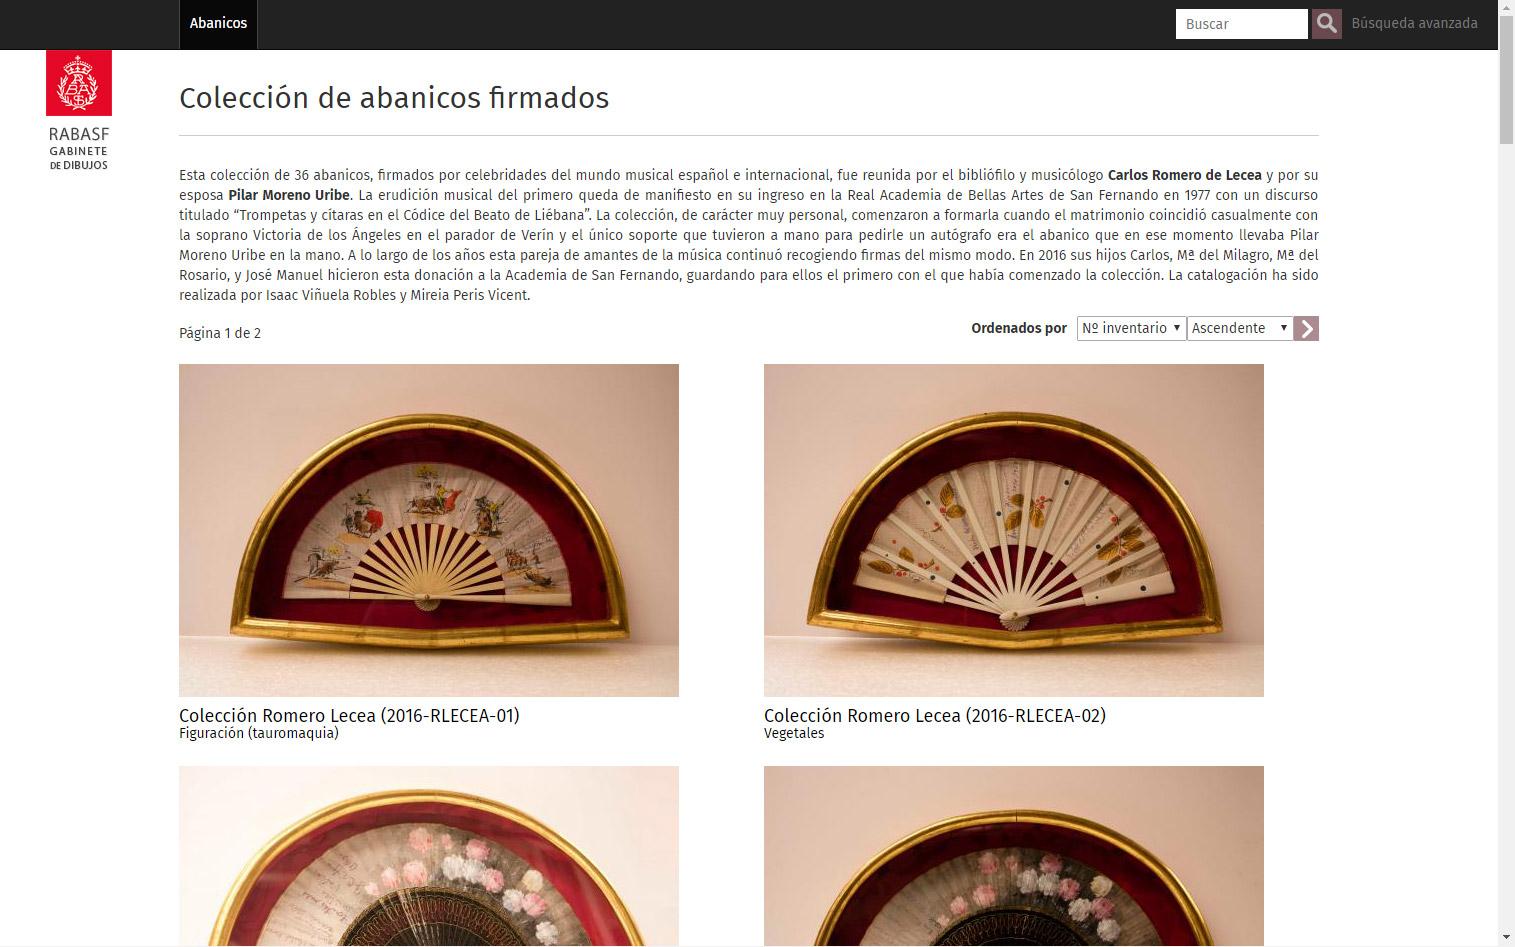 Imagen 1 de 4 - Colecci贸n de abanicos Romero Lecea